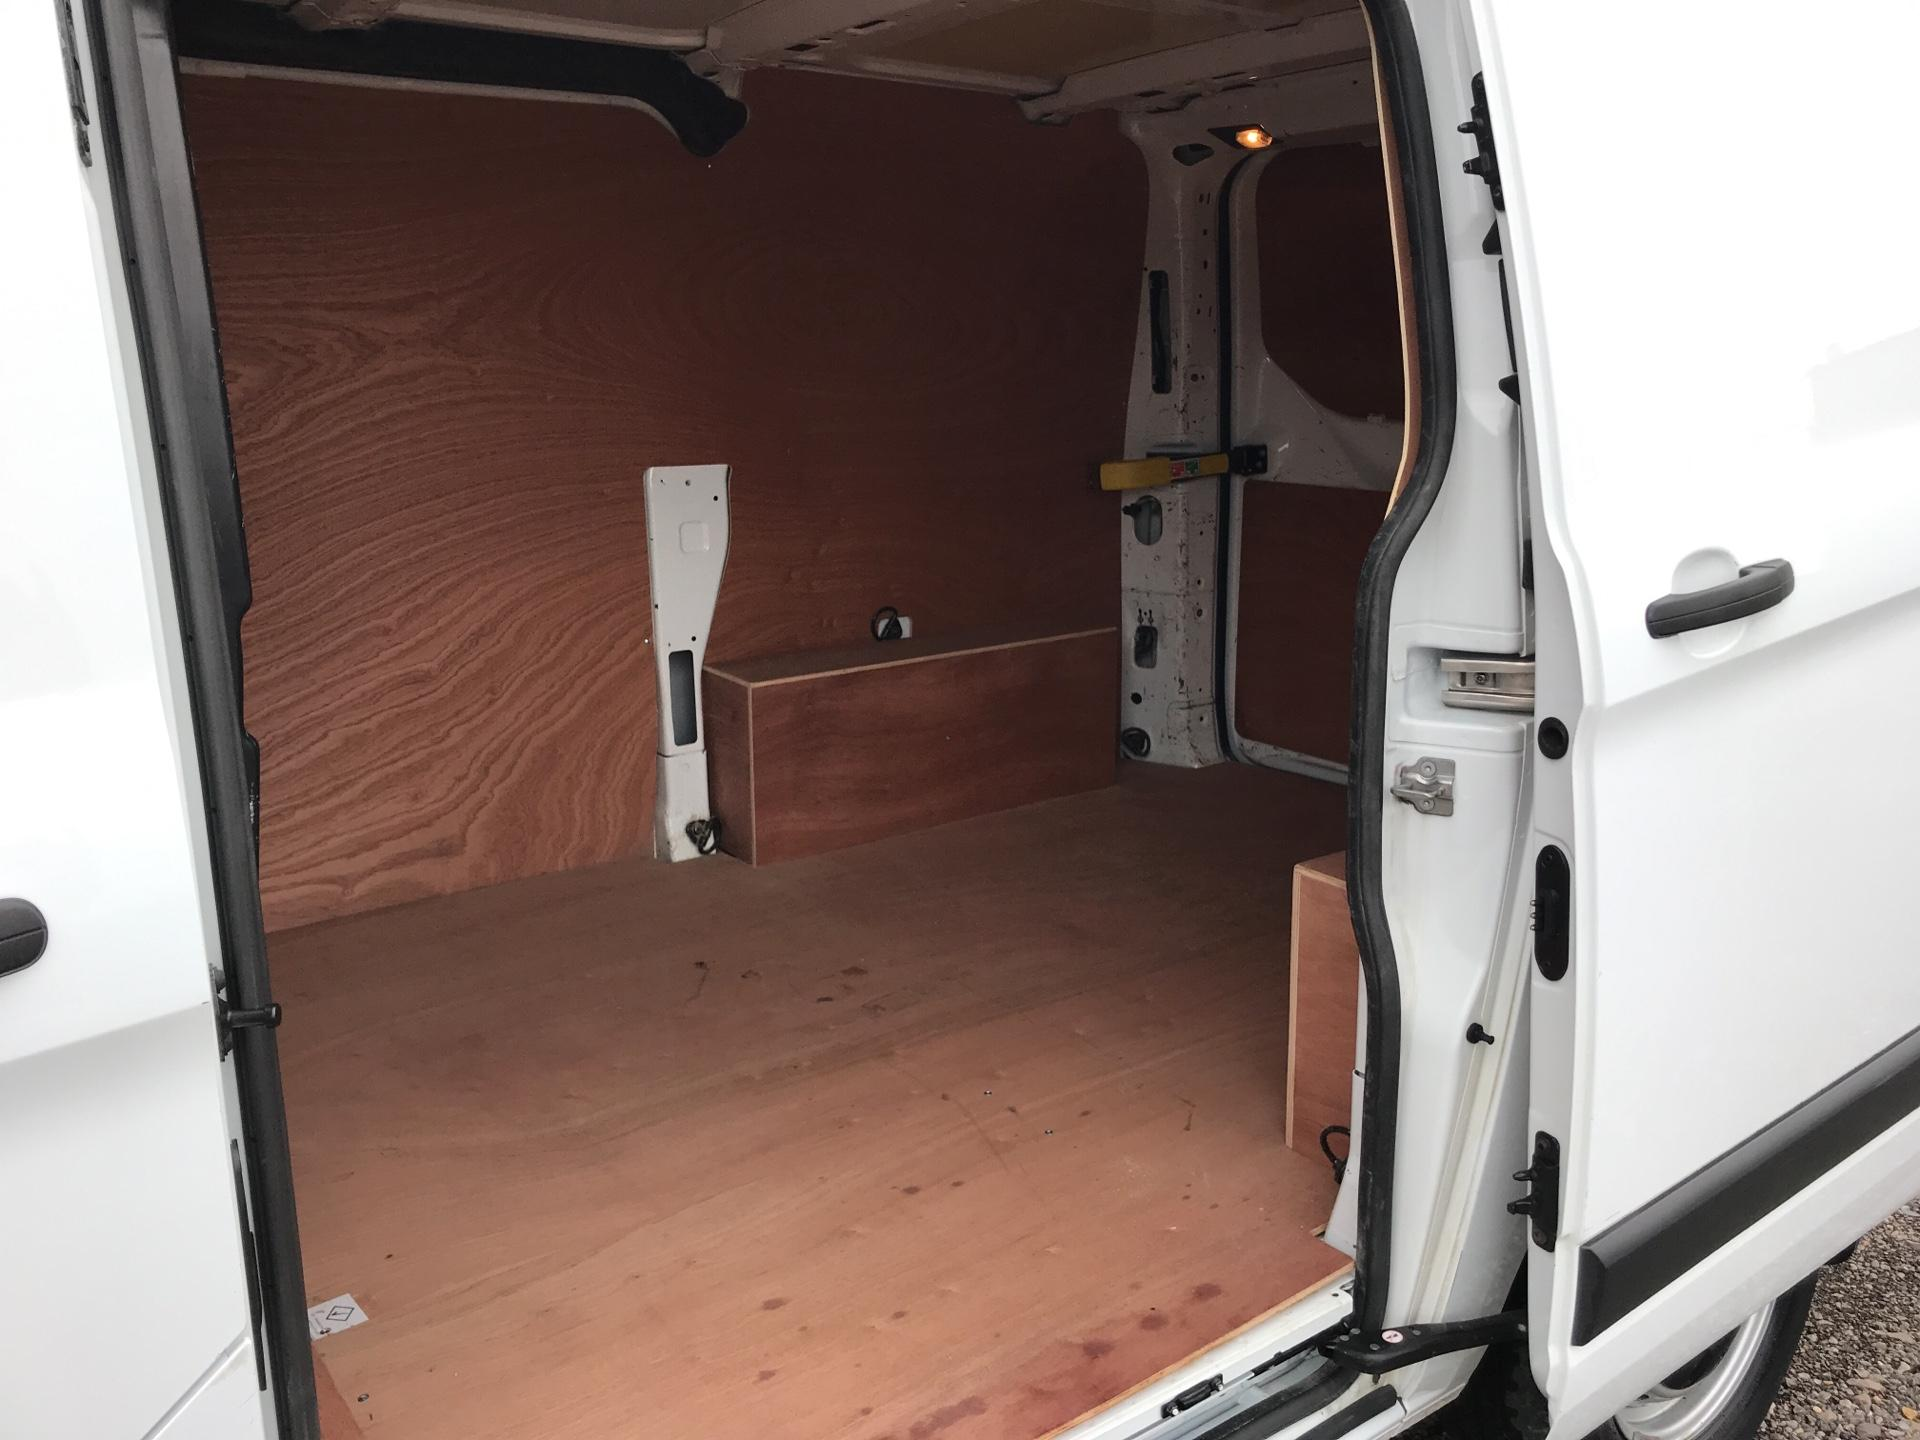 2014 Ford Transit Custom 290 L1 DIESEL FWD 2.2 TDCI 100PS LOW ROOF EURO 5 (NJ64MJO) Image 17